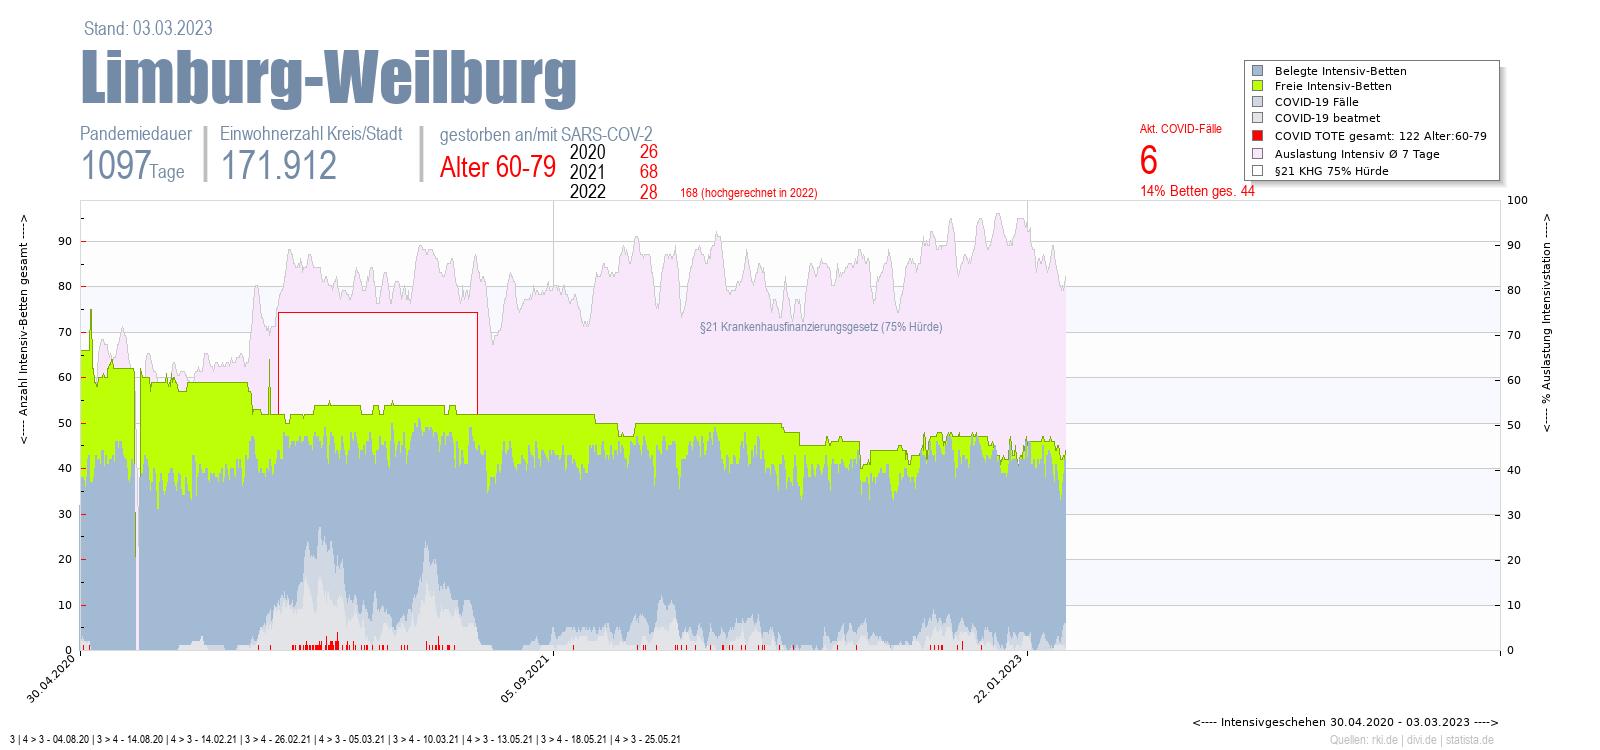 Intensivstation Auslastung Limburg-Weilburg Alter 0-4